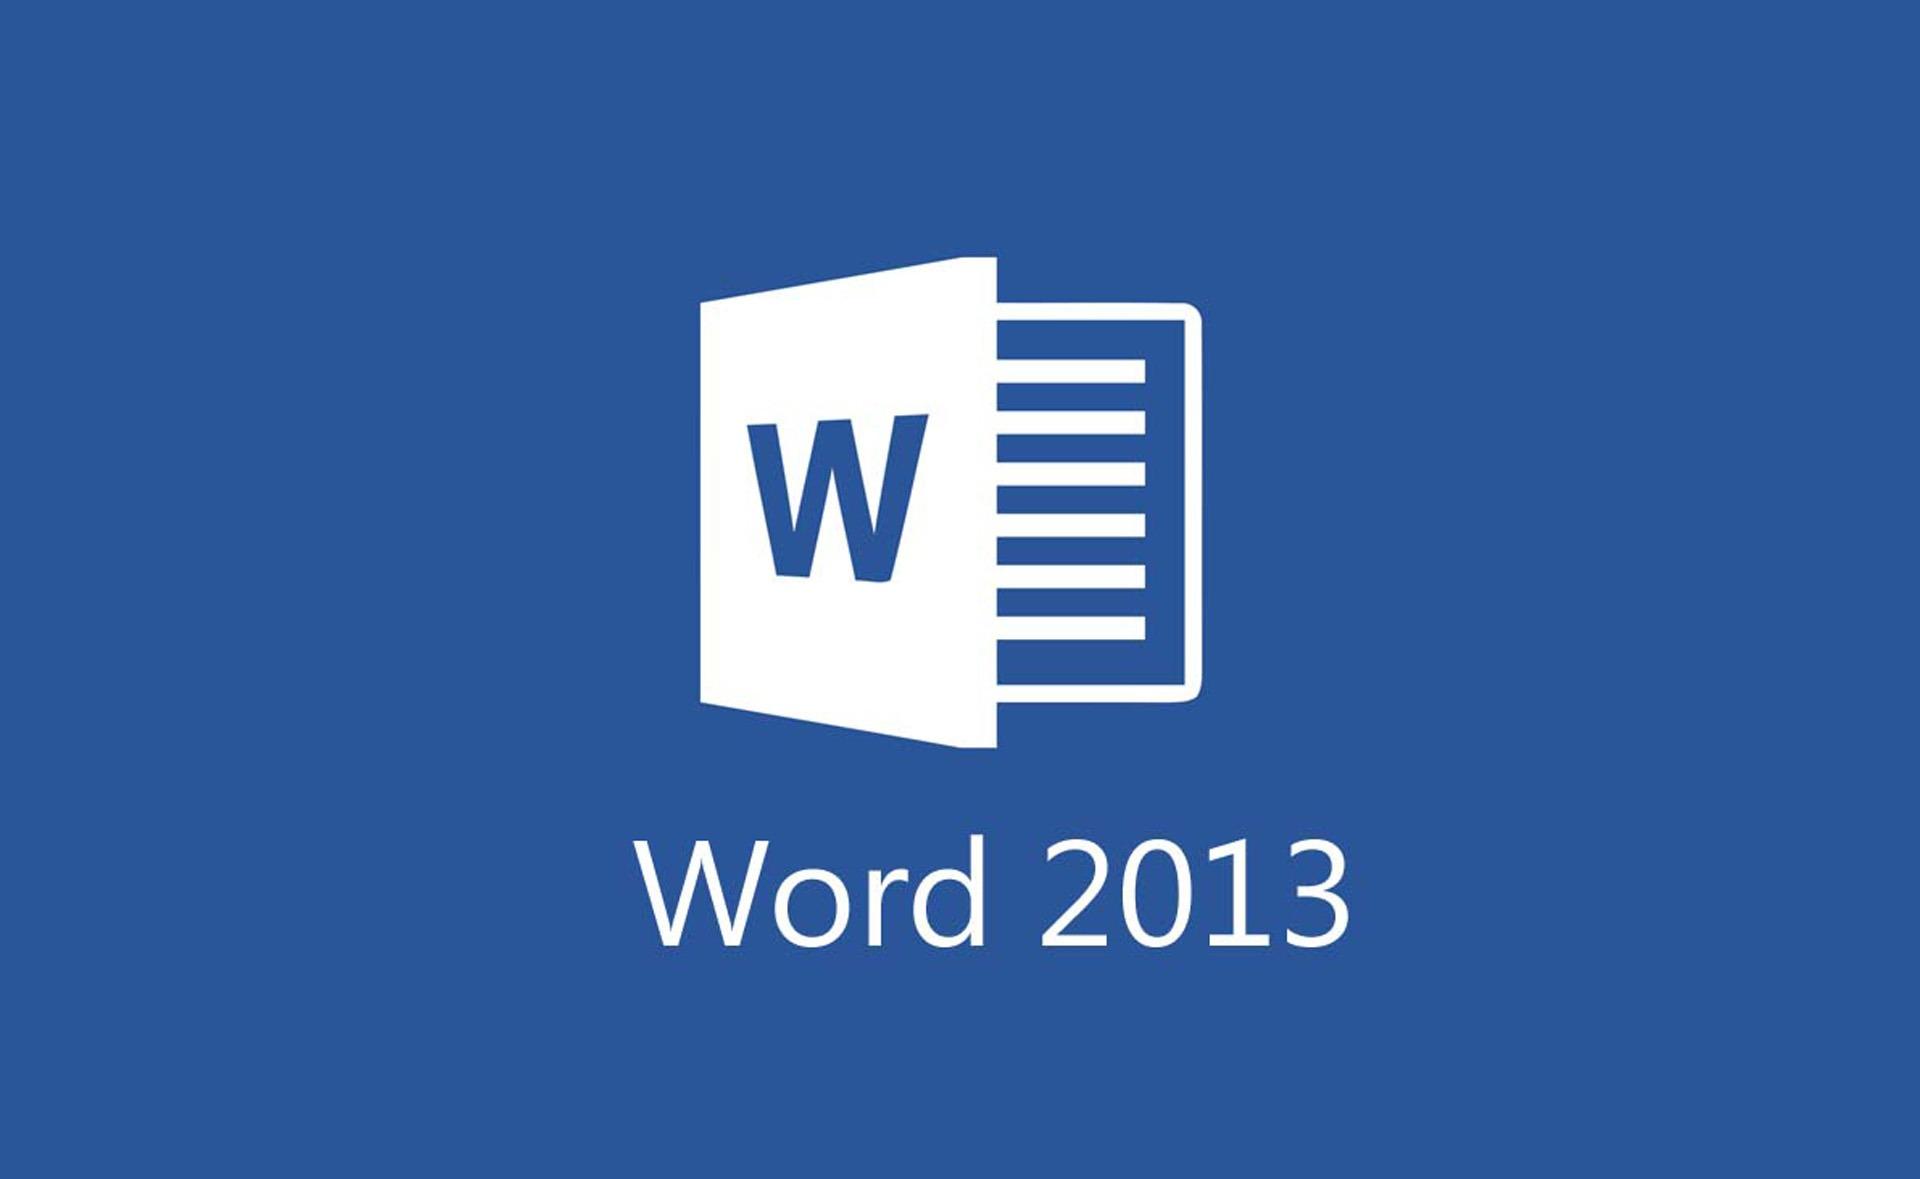 mos word 2013 online edusa